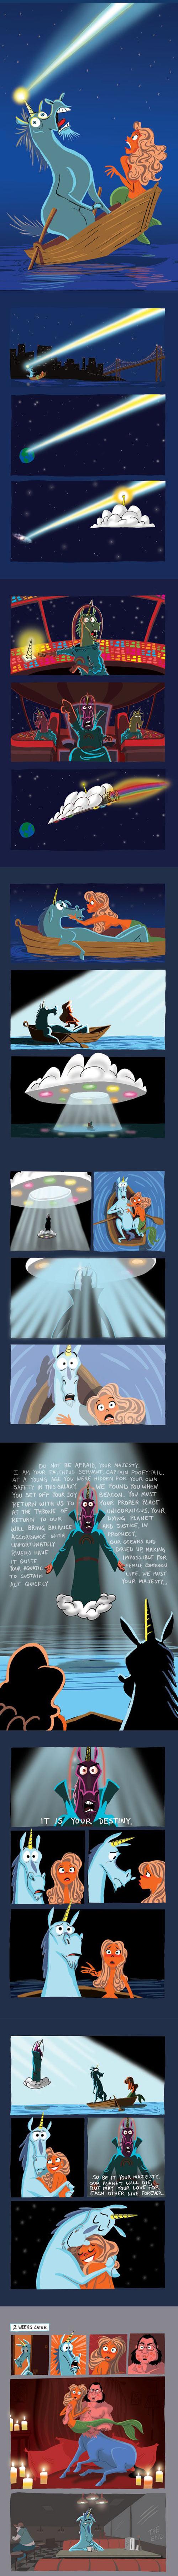 cool-lonely-unicorn-mermaid-comic